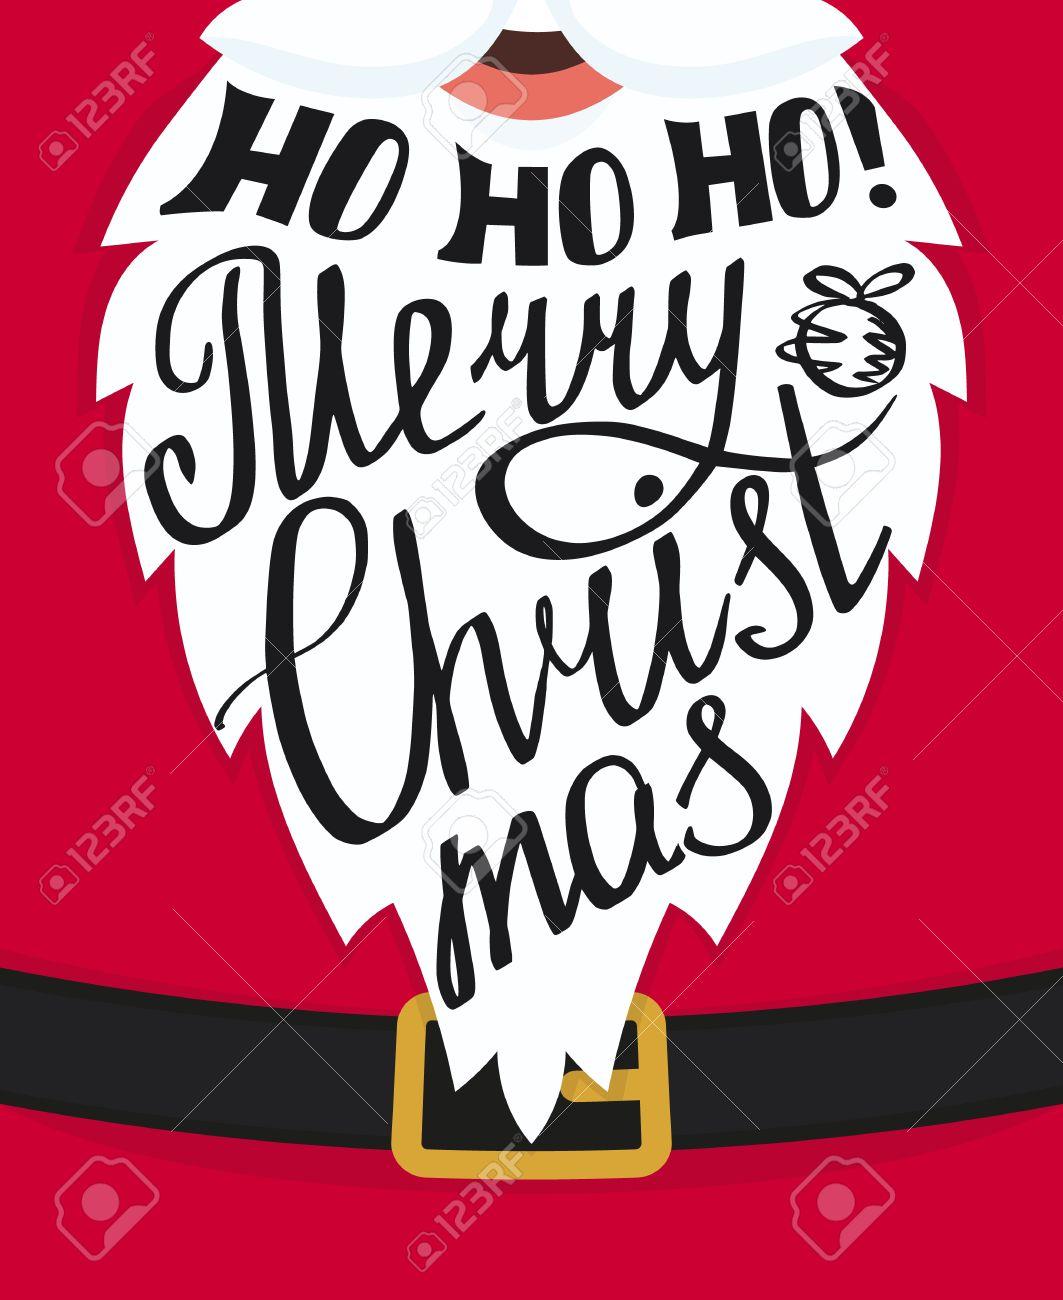 Ho Ho Ho Merry Christmas Handmade Lettering On The Santa Claus ...